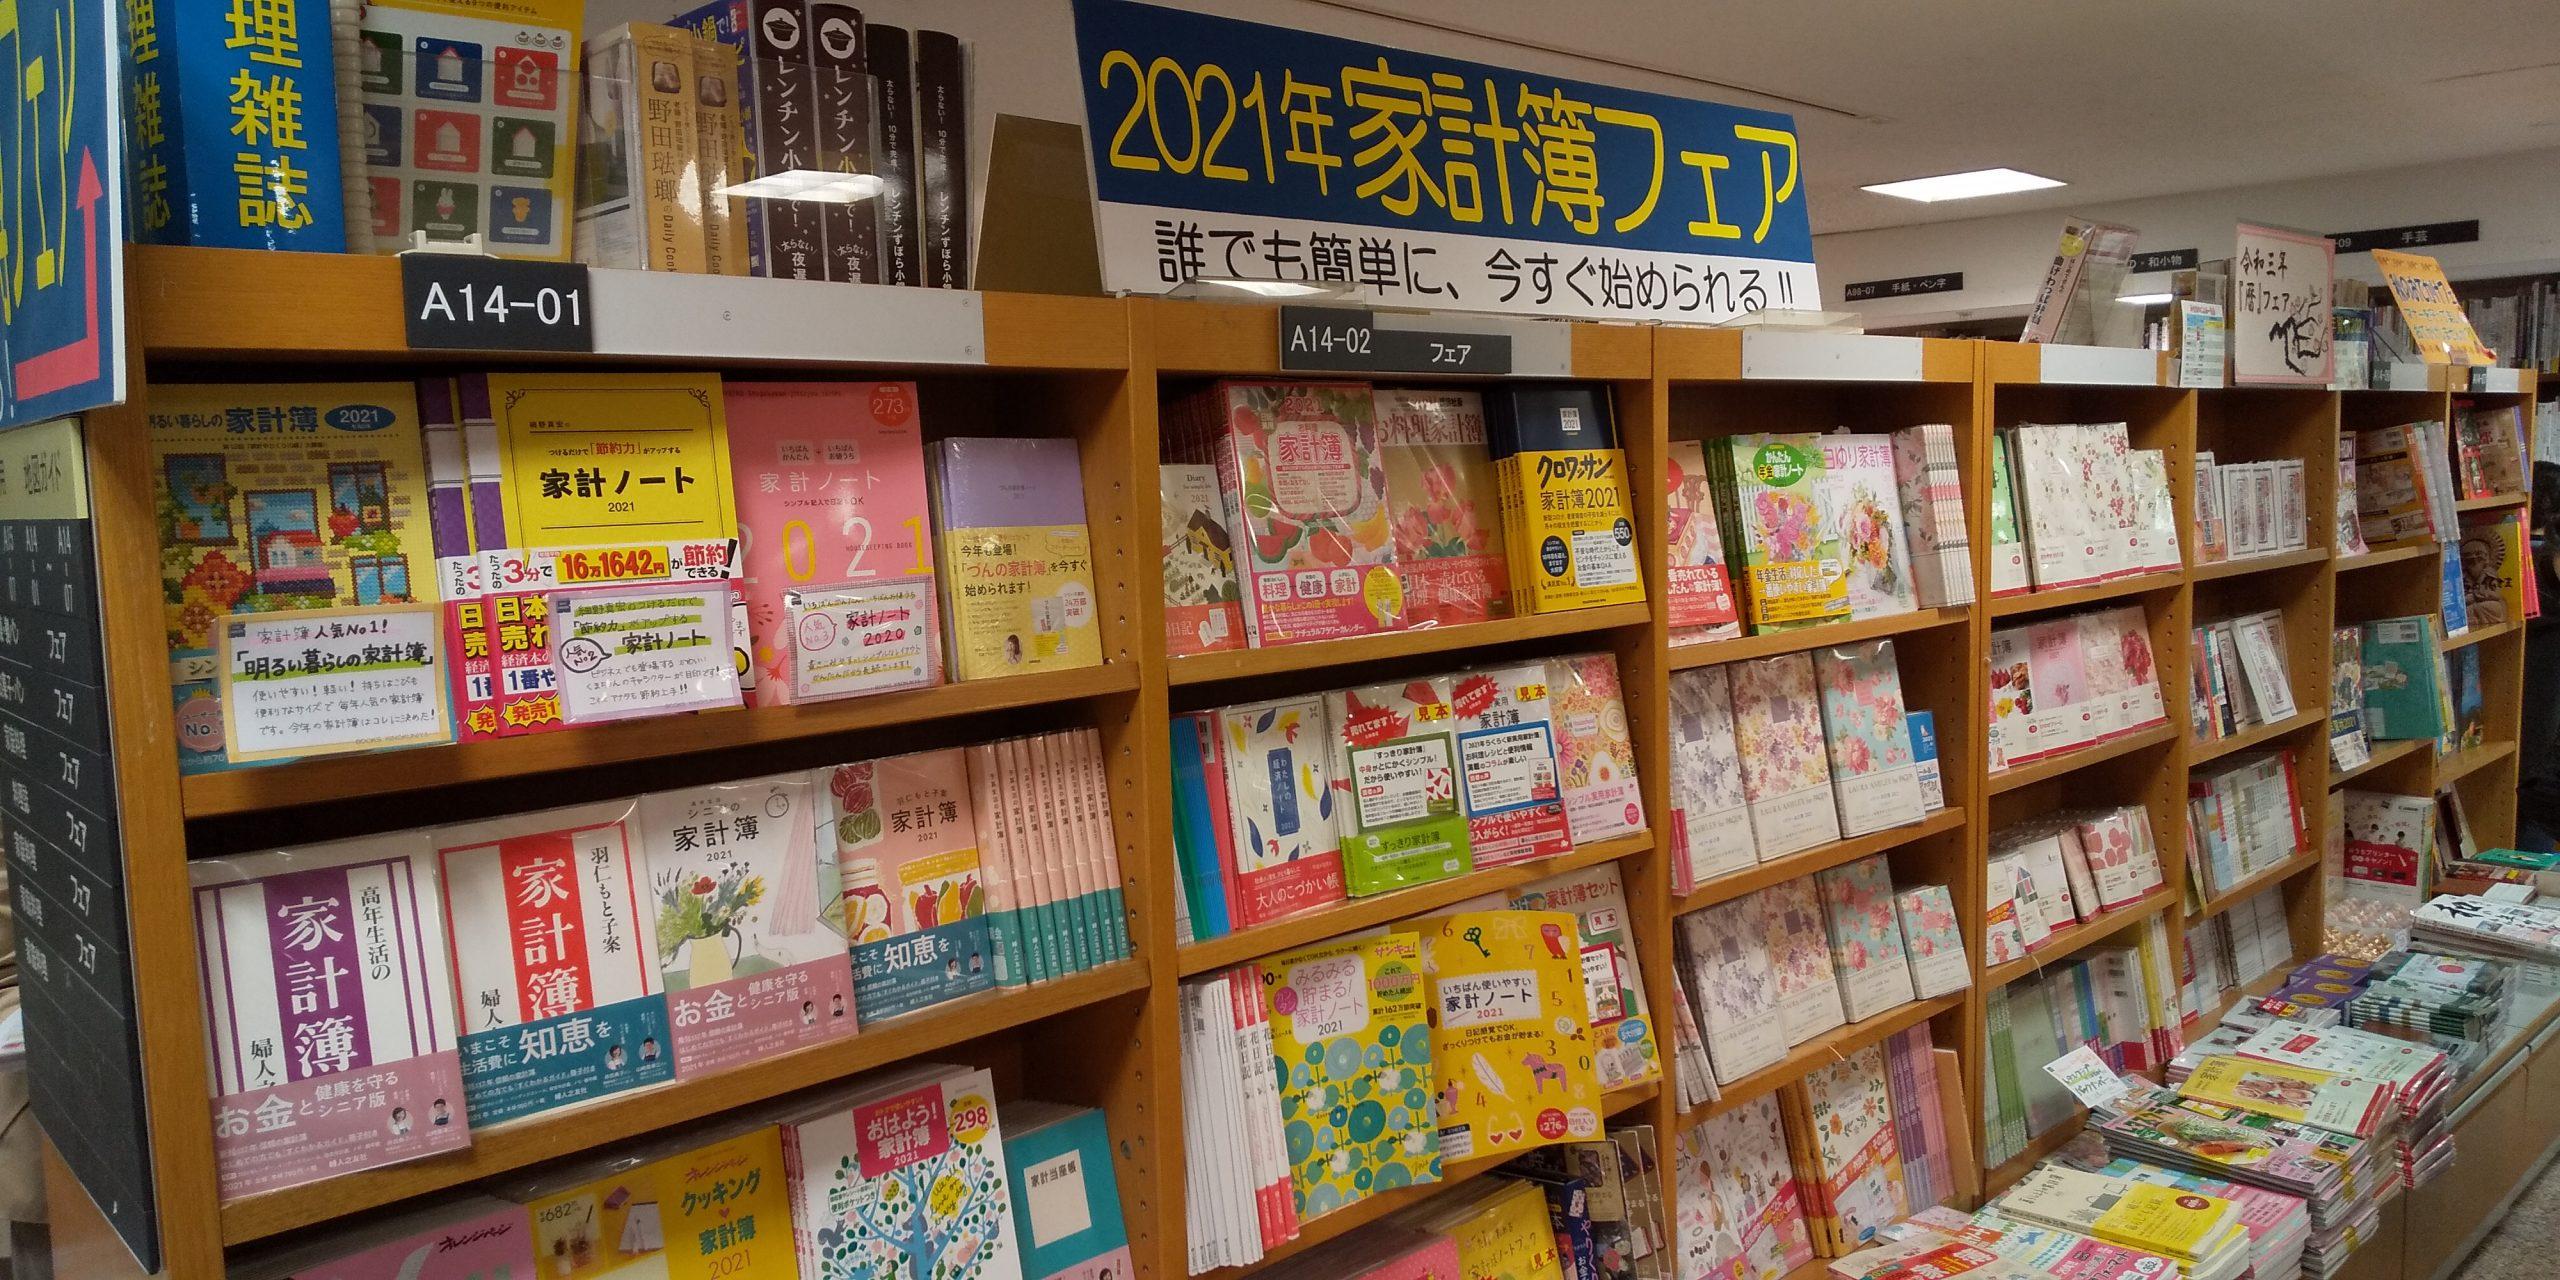 紀伊國屋書店:2021年家計簿フェア